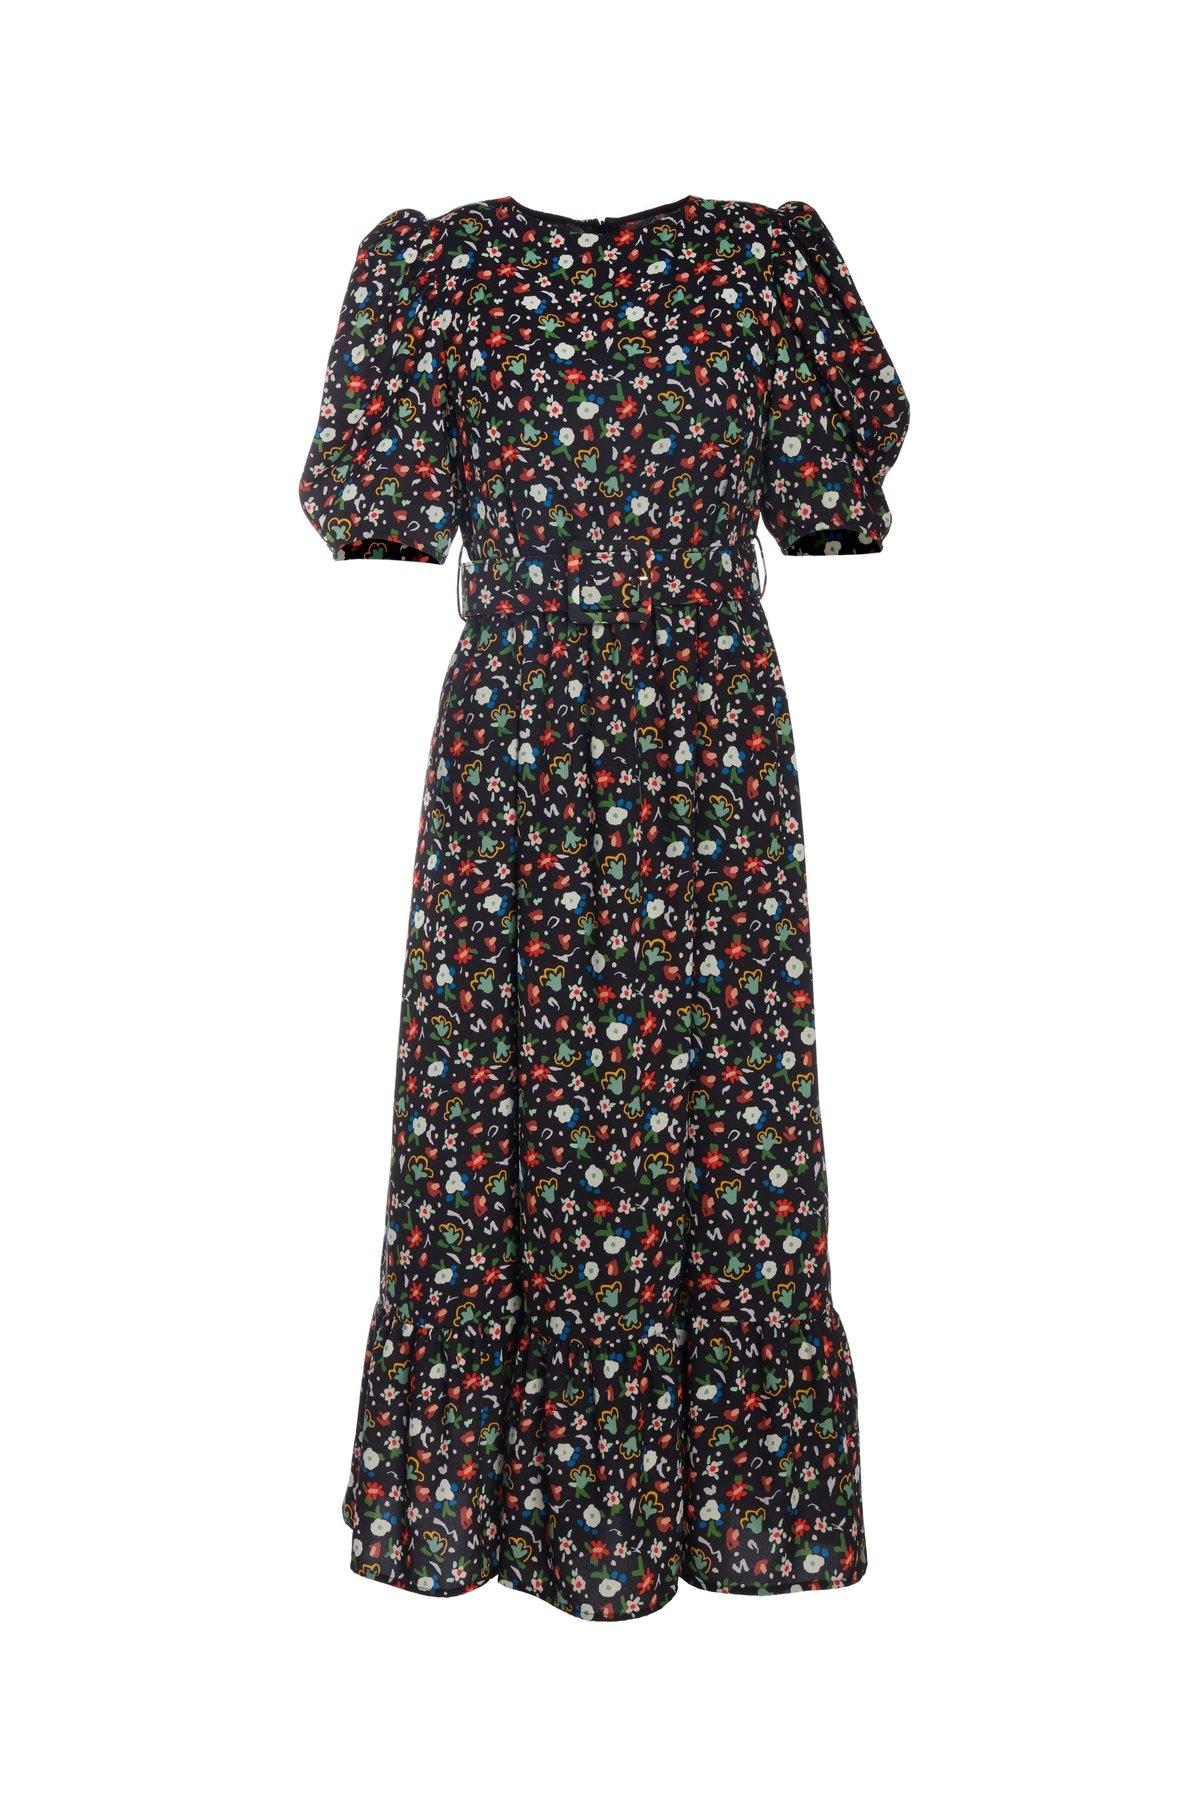 Crosby By Mollie Burch Flora Dress Boho Blooms